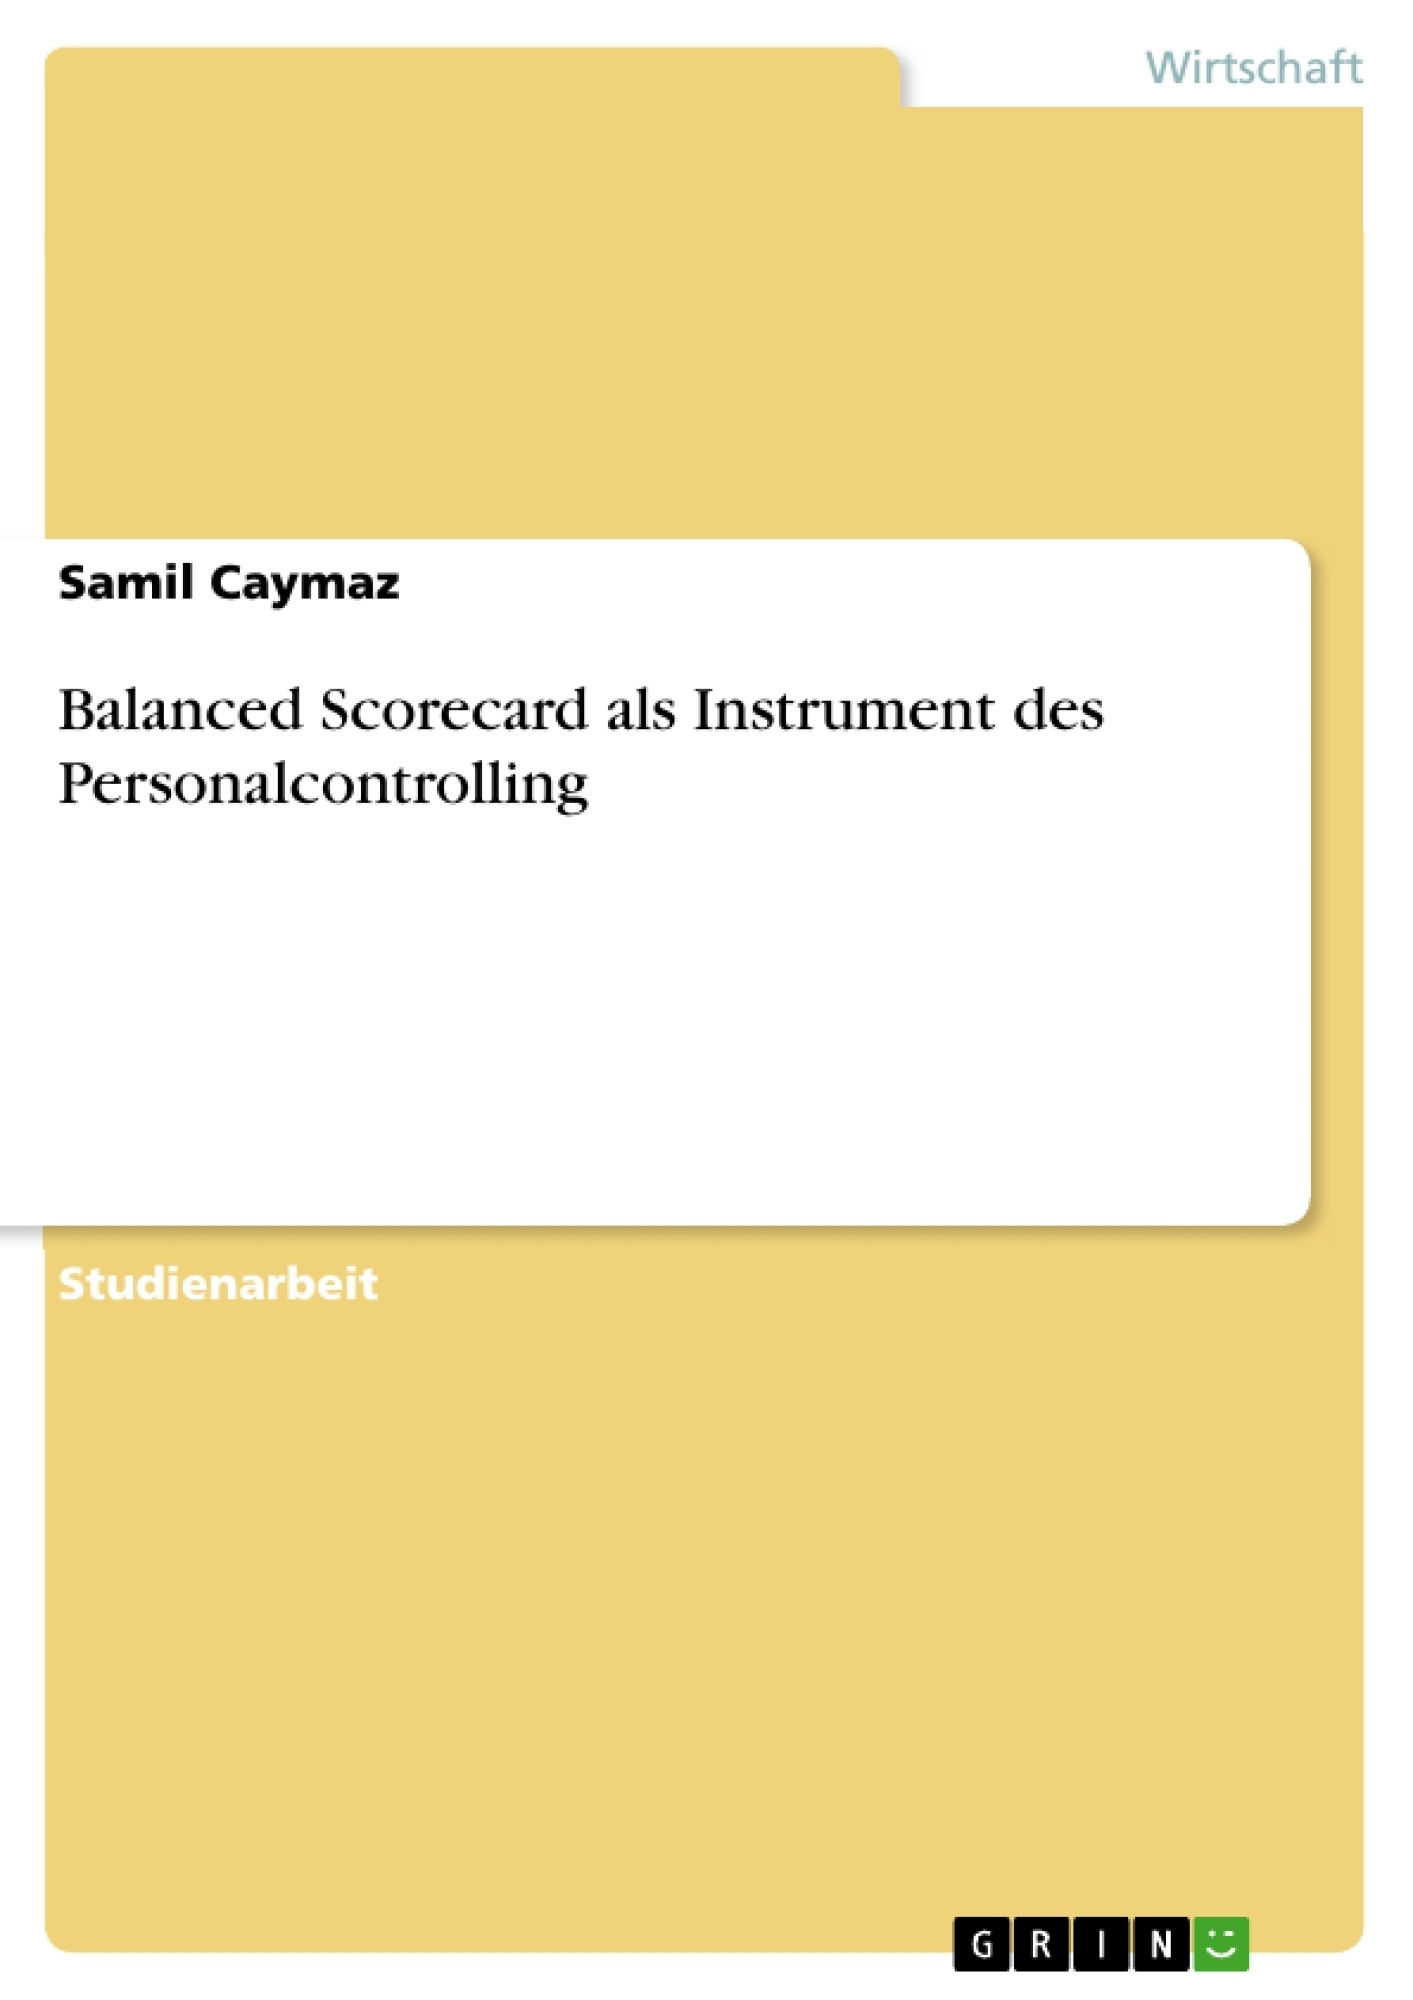 Titel: Balanced Scorecard als Instrument des Personalcontrolling